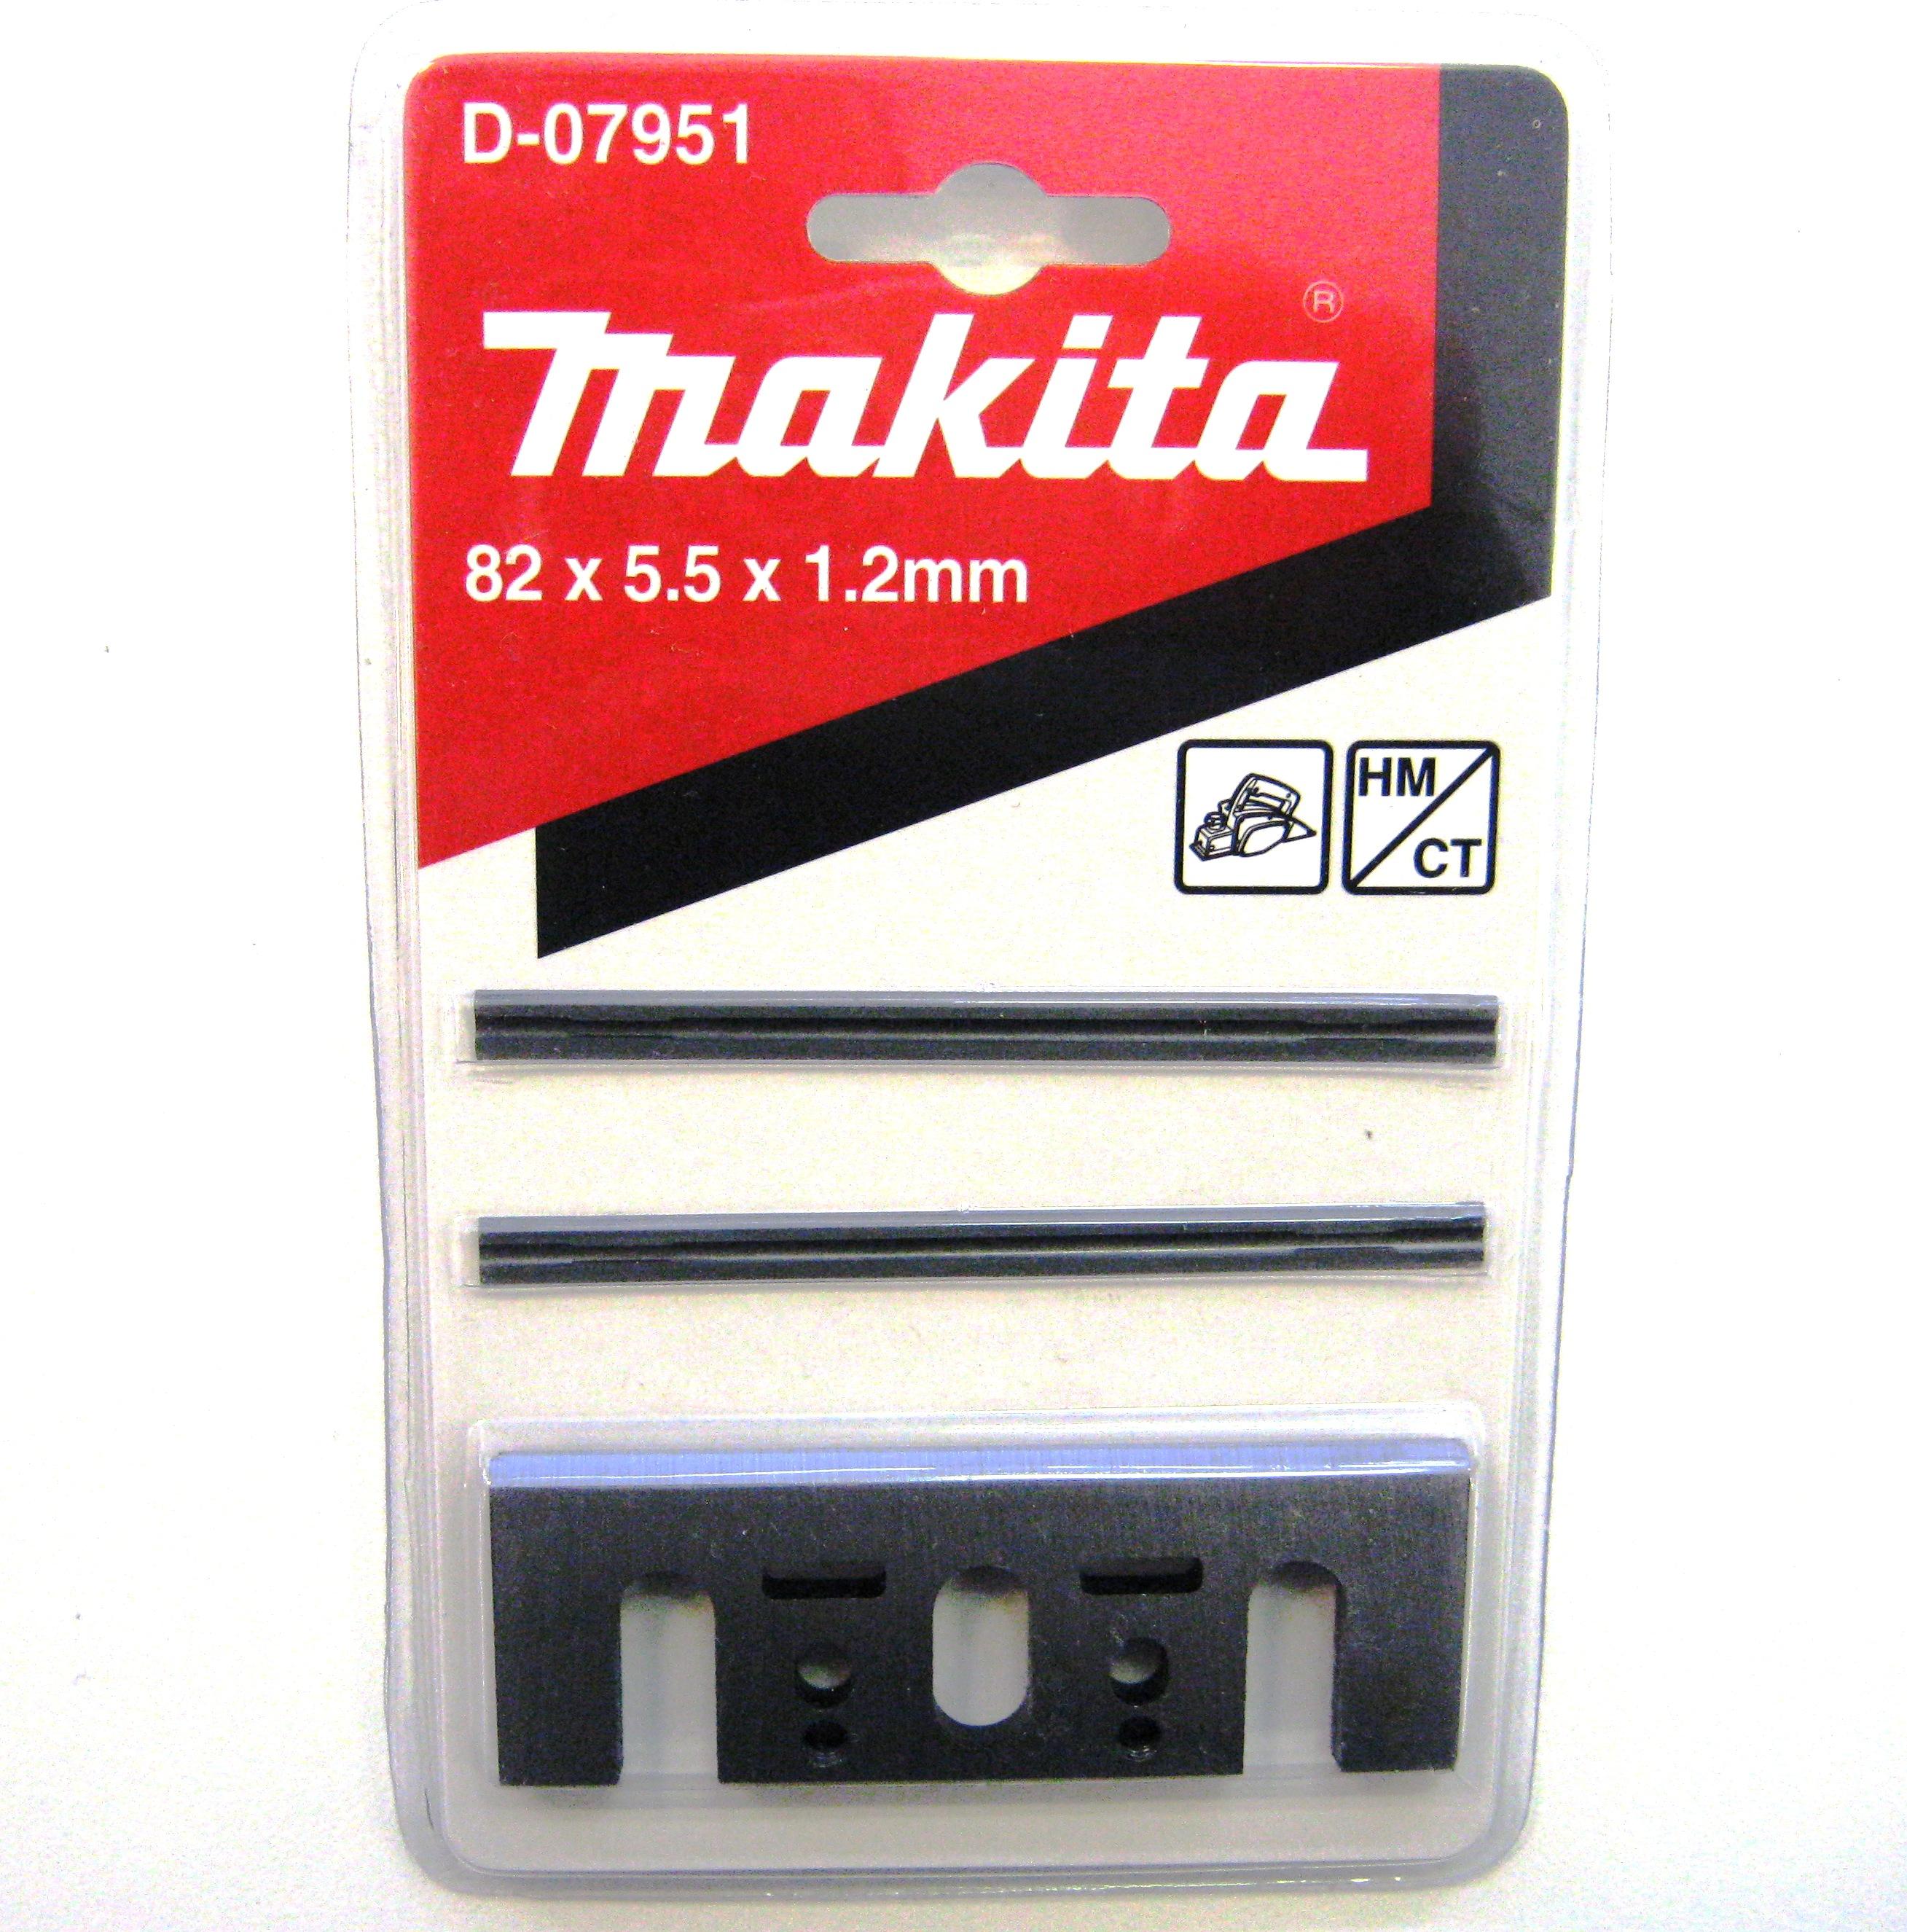 Ножи для рубанка Makita 82 мм, 2 шт. (пластина+лезвие) кеннел с на острие ножа роман